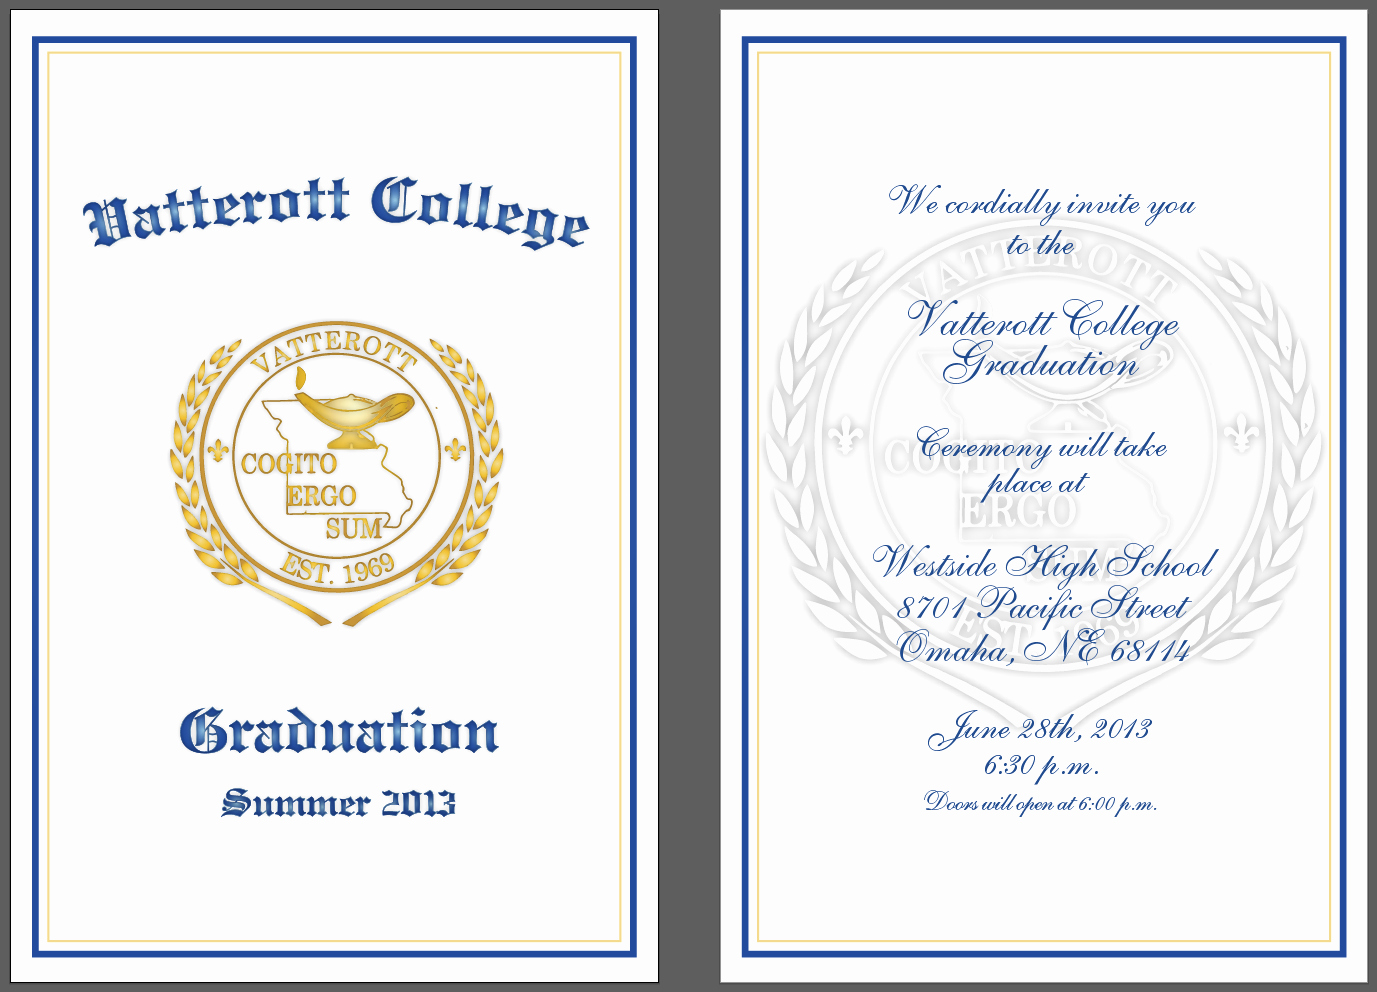 Graduation Program Template Microsoft Word Luxury Preschool Graduation Ceremony Program Sample